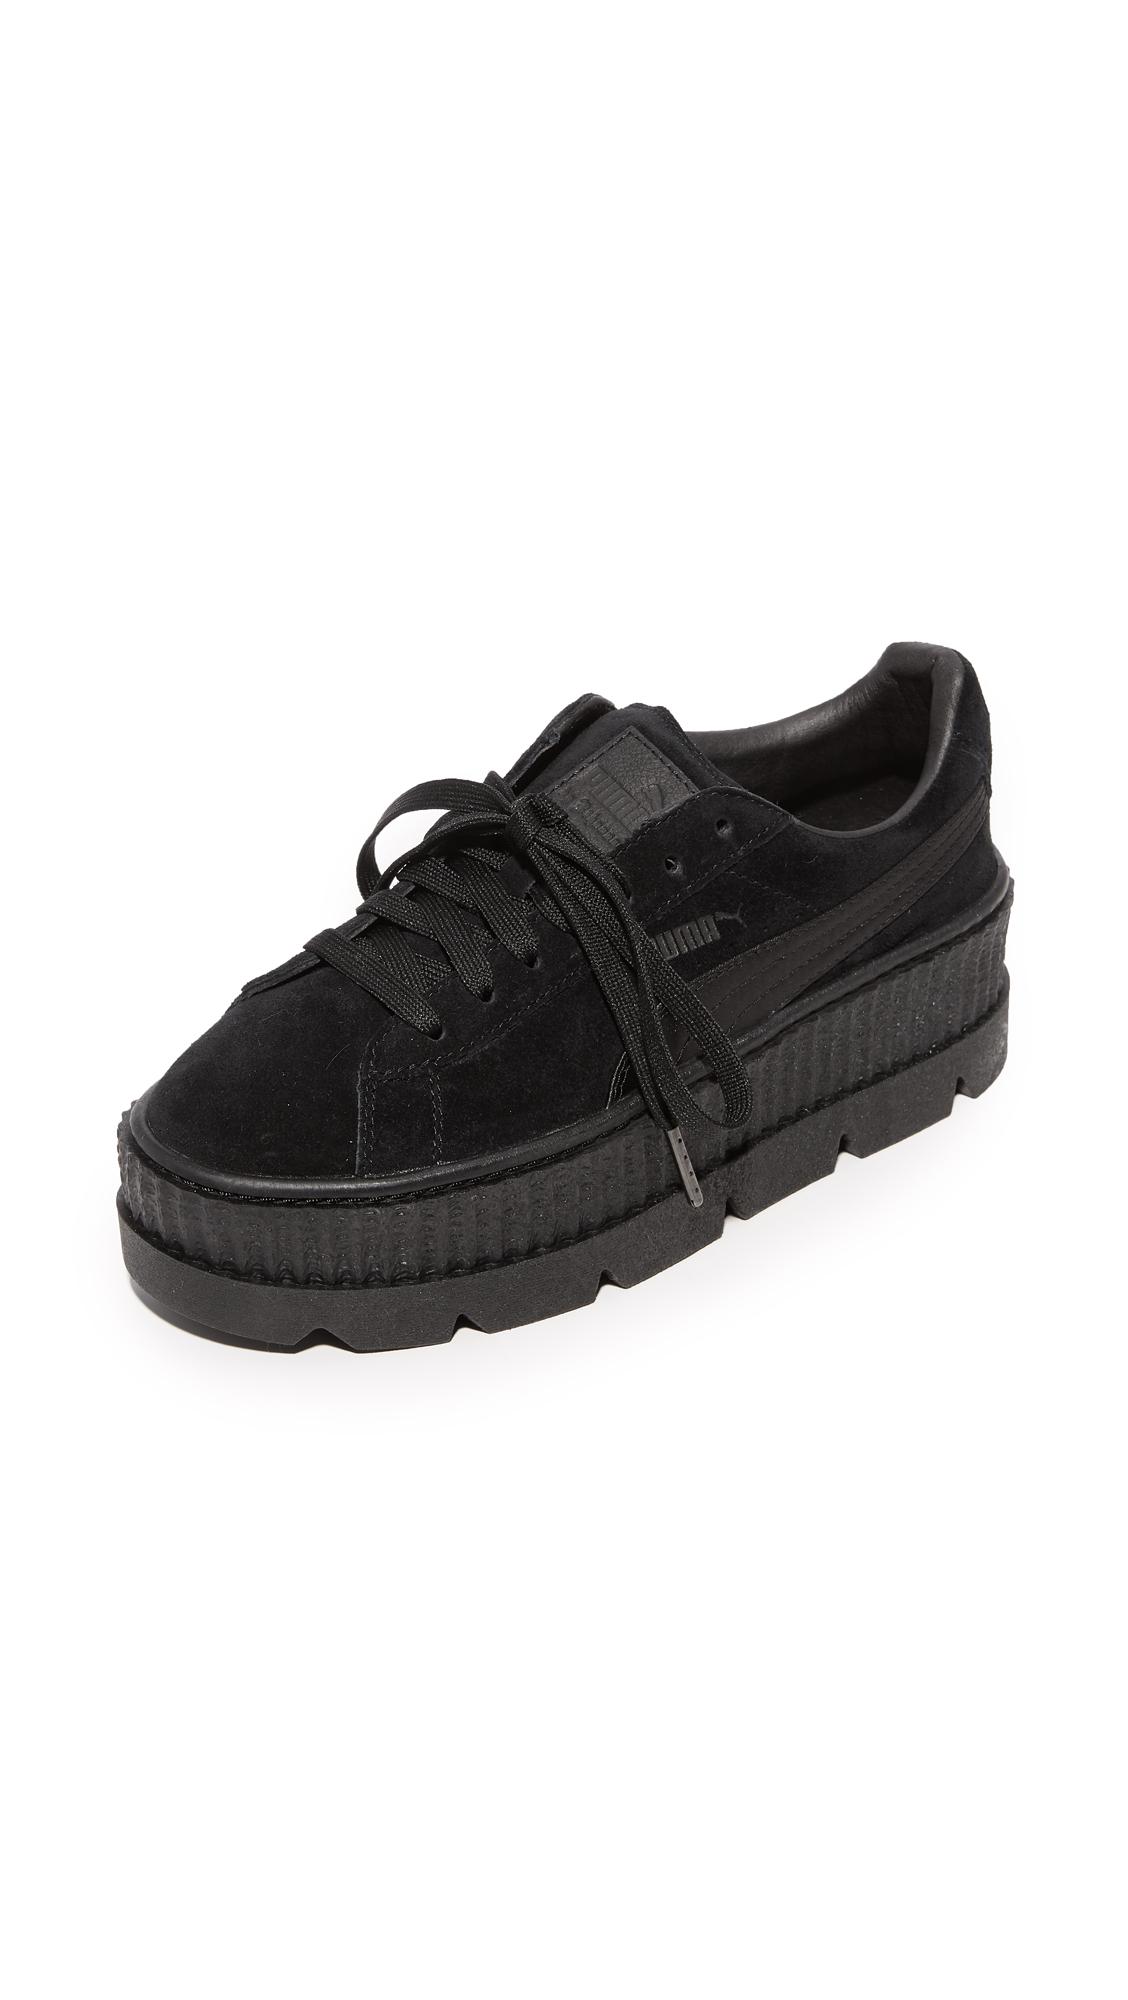 PUMA FENTY x PUMA Cleated Sneakers - Puma Black